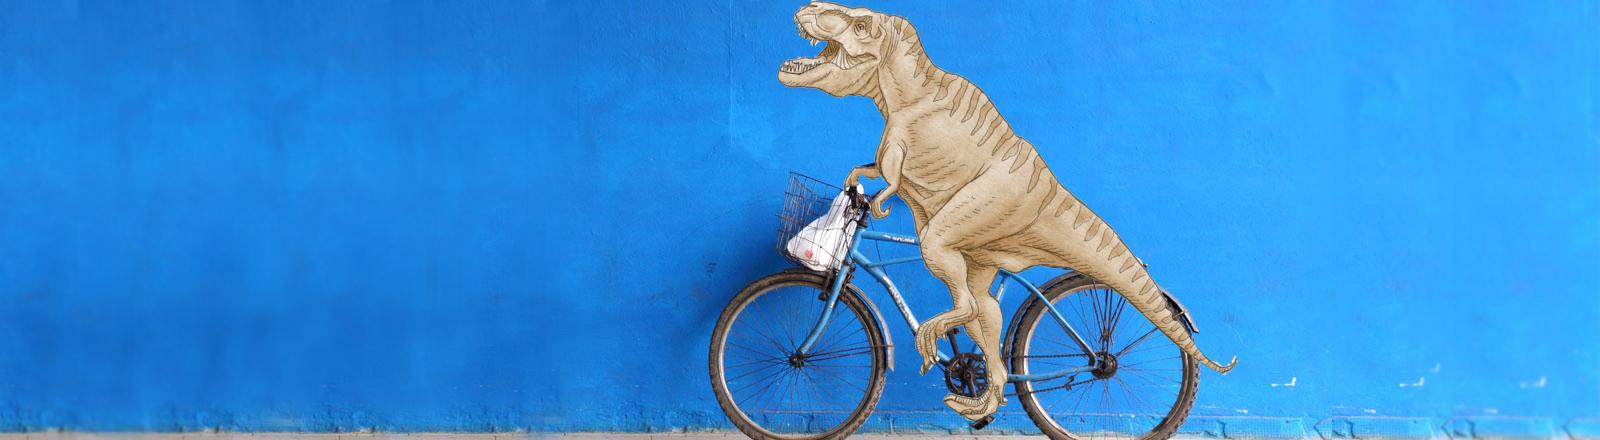 Tyrannosaurus auf Fahrrad